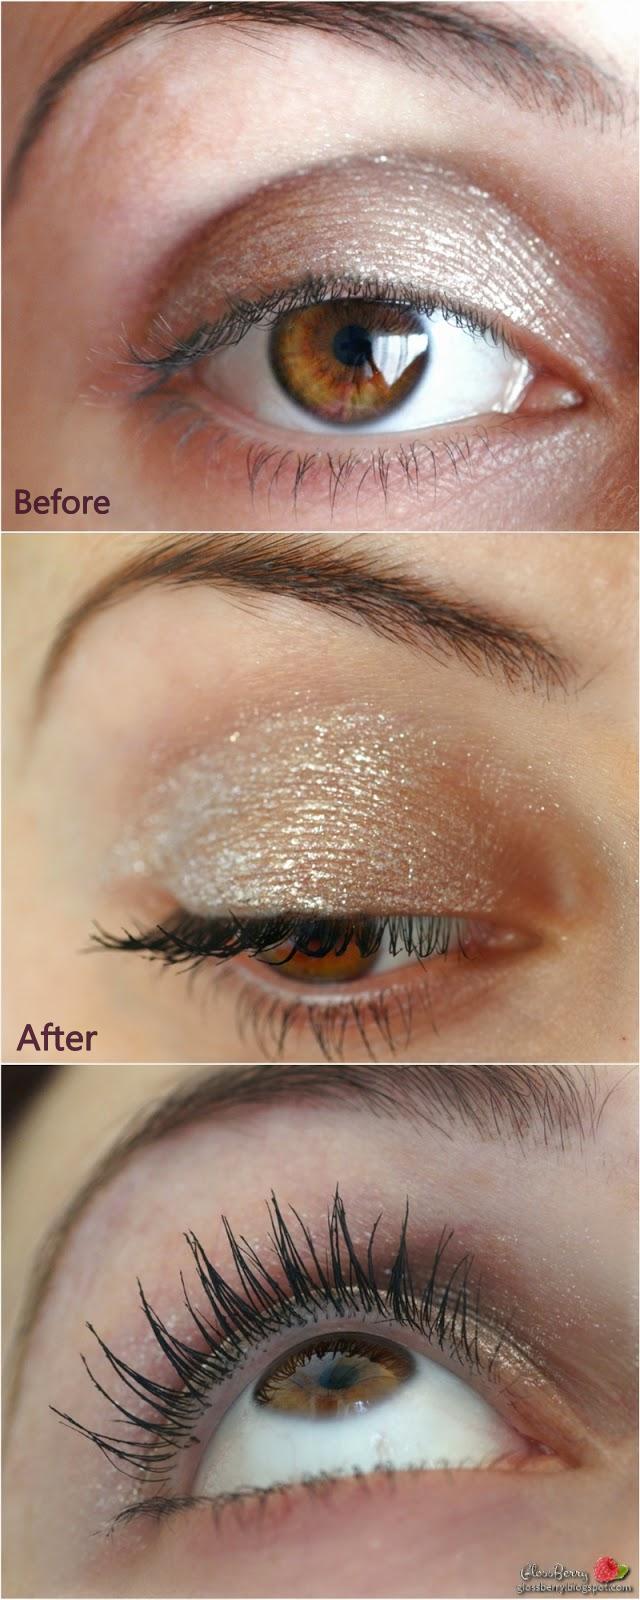 pupa black mascara ultraflex review swatches beauty blog סקירה מסקרה פופה שחורה אולטרה פלקס אולטראפלקס כדאי נפח בלוג איפור וטיפוח